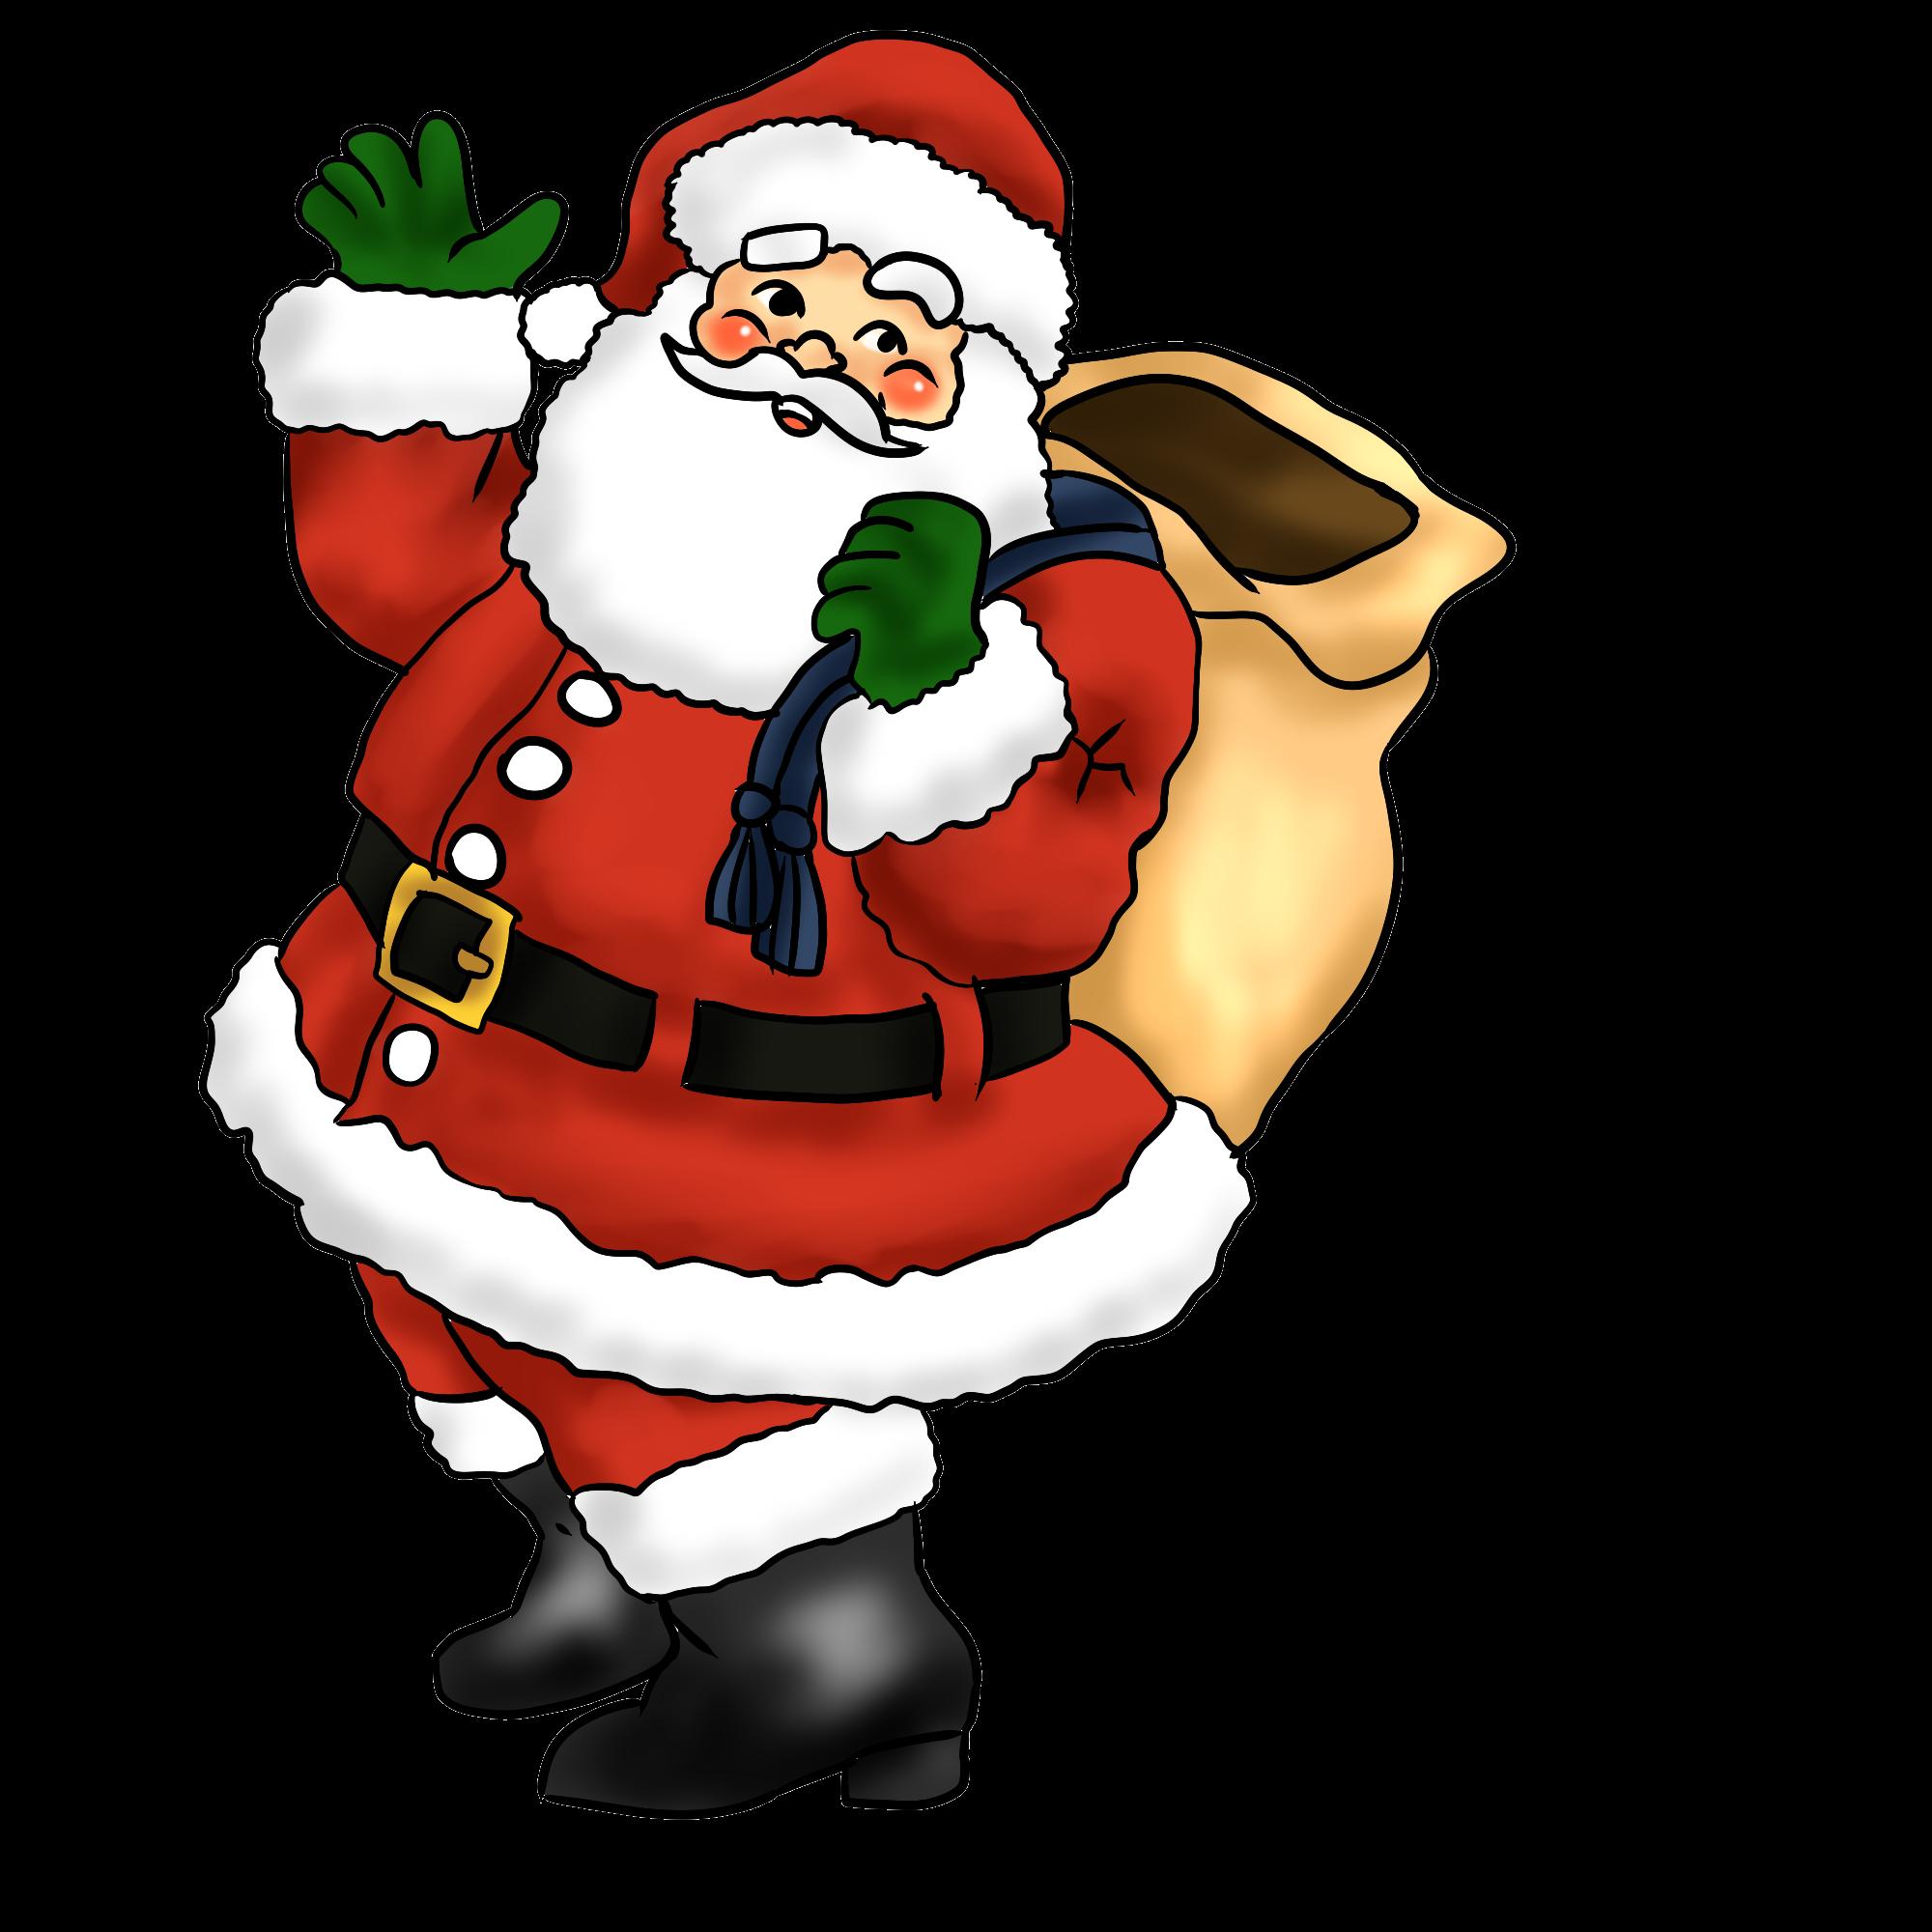 2000x2000 Santa Claus Clip Art Many Interesting Cliparts